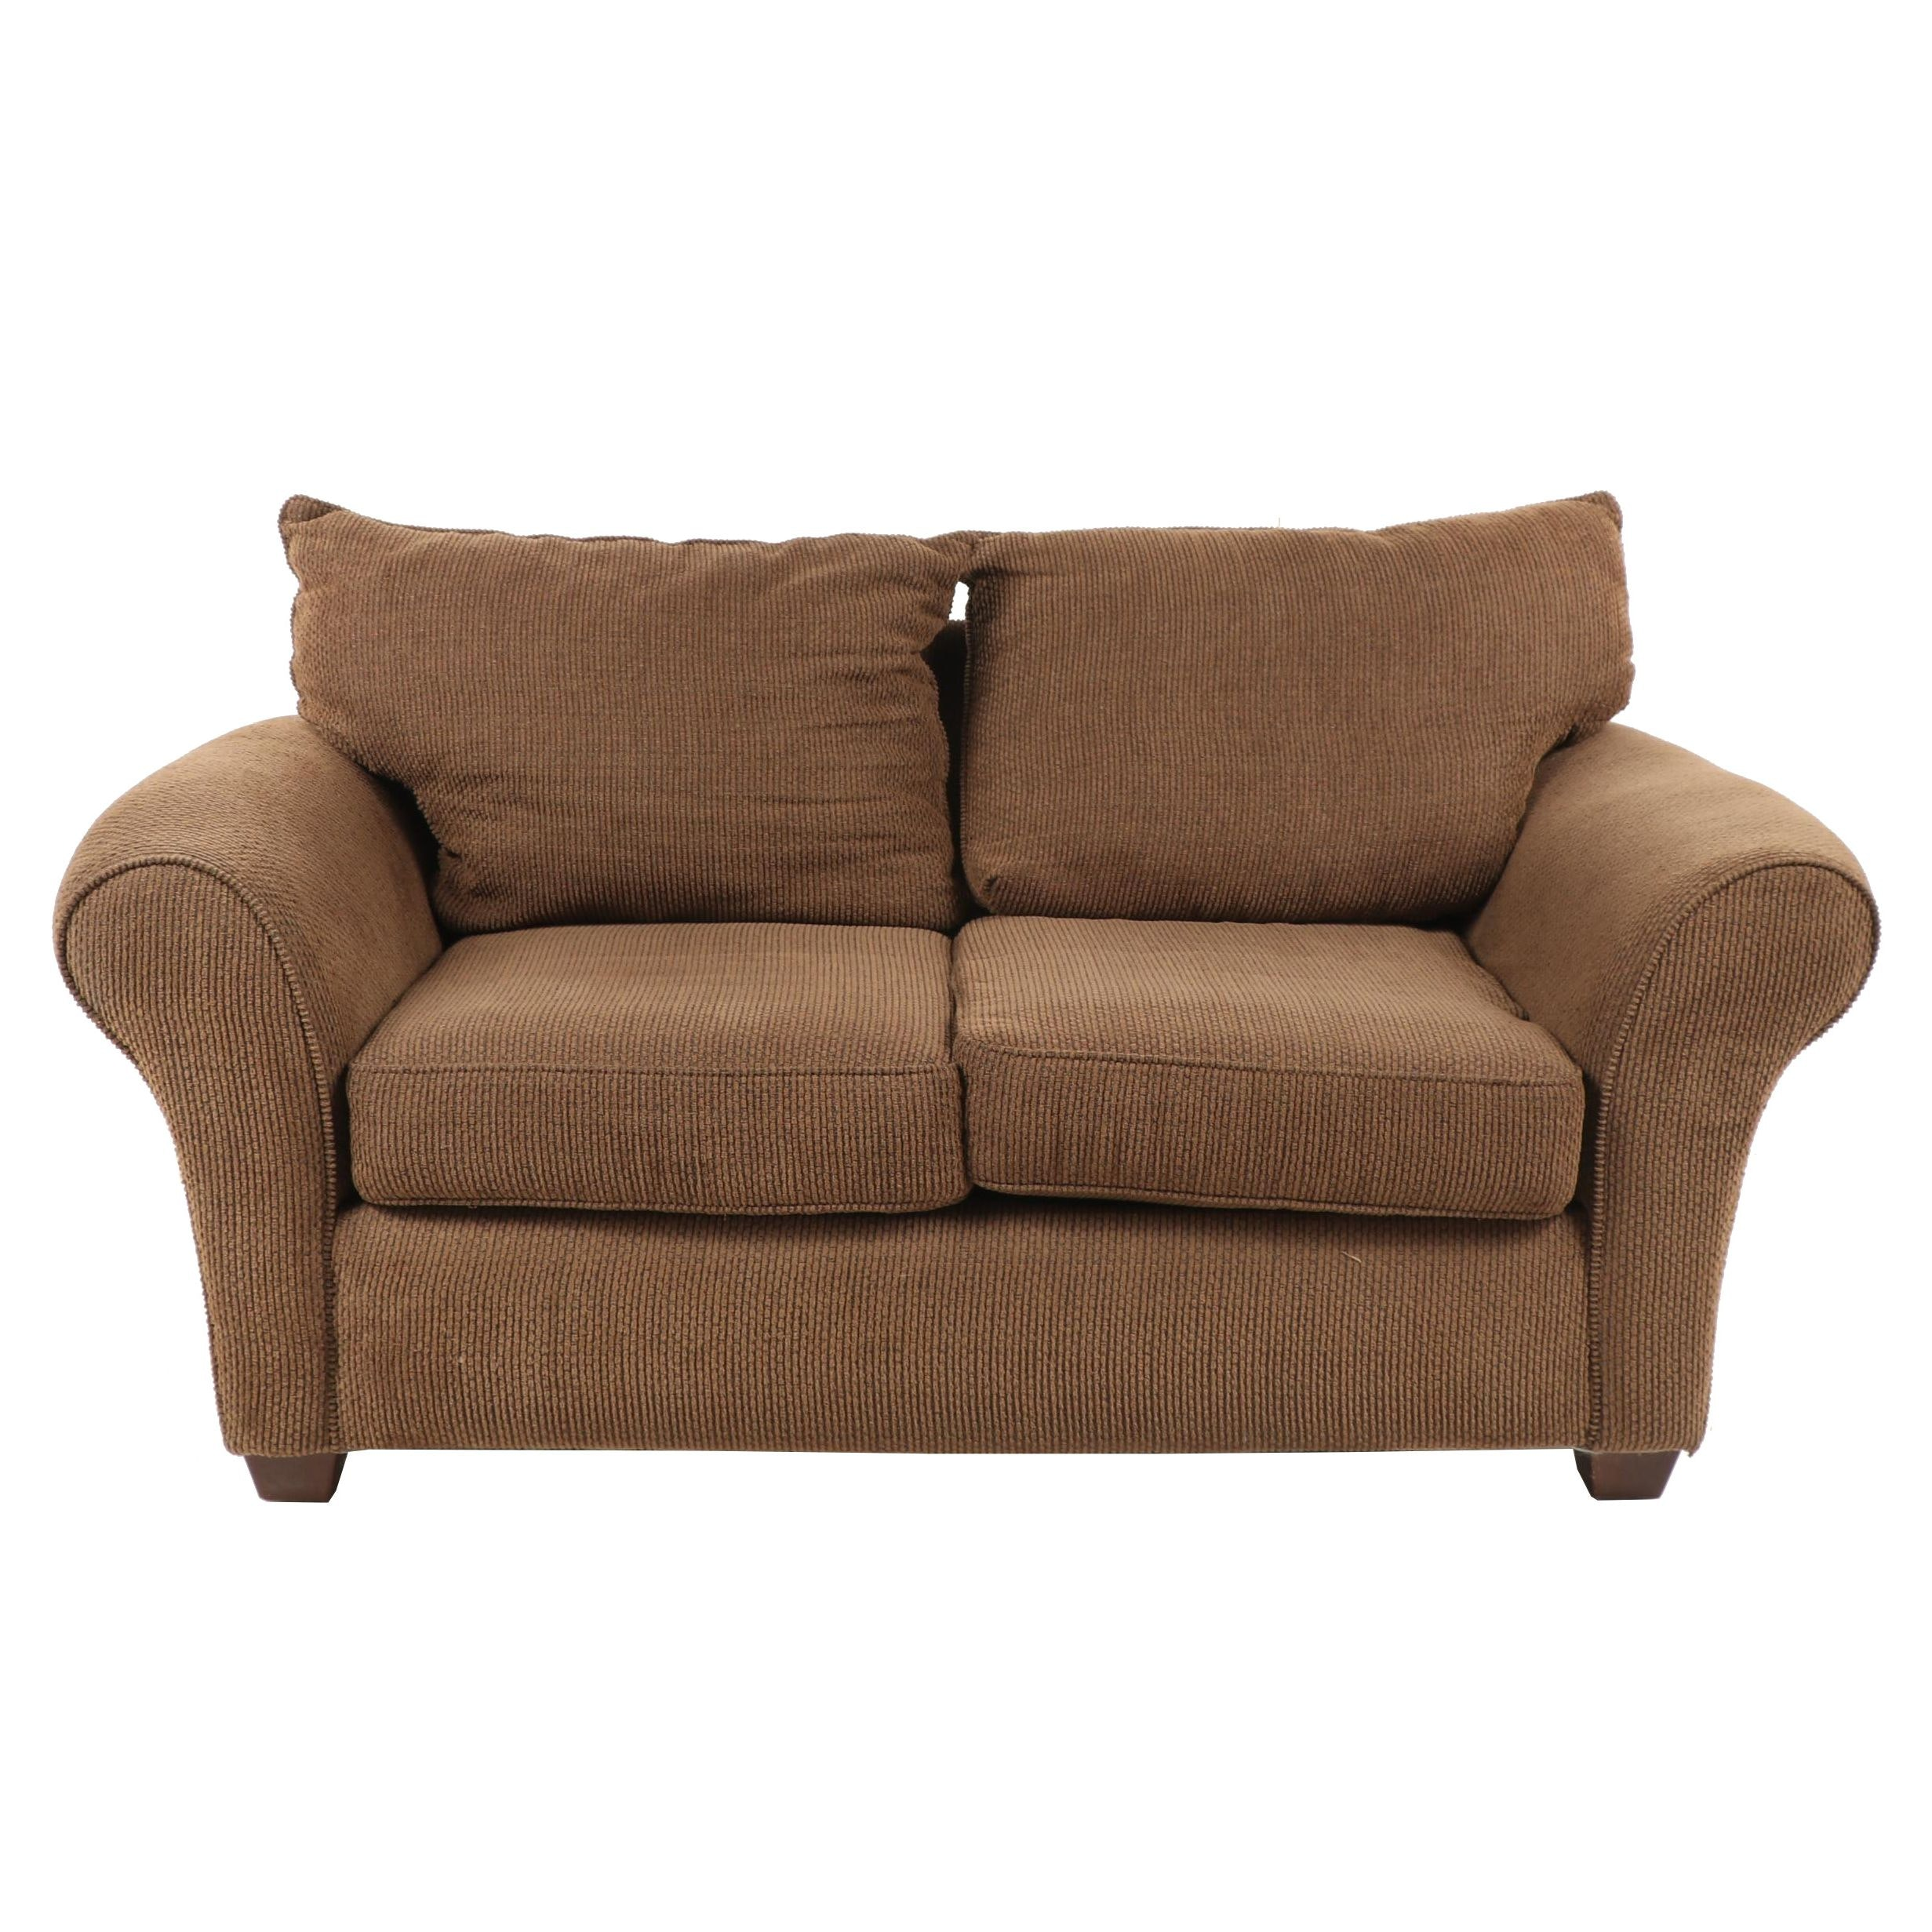 Contemporary Alan White Upholstered Loveseat Sofa